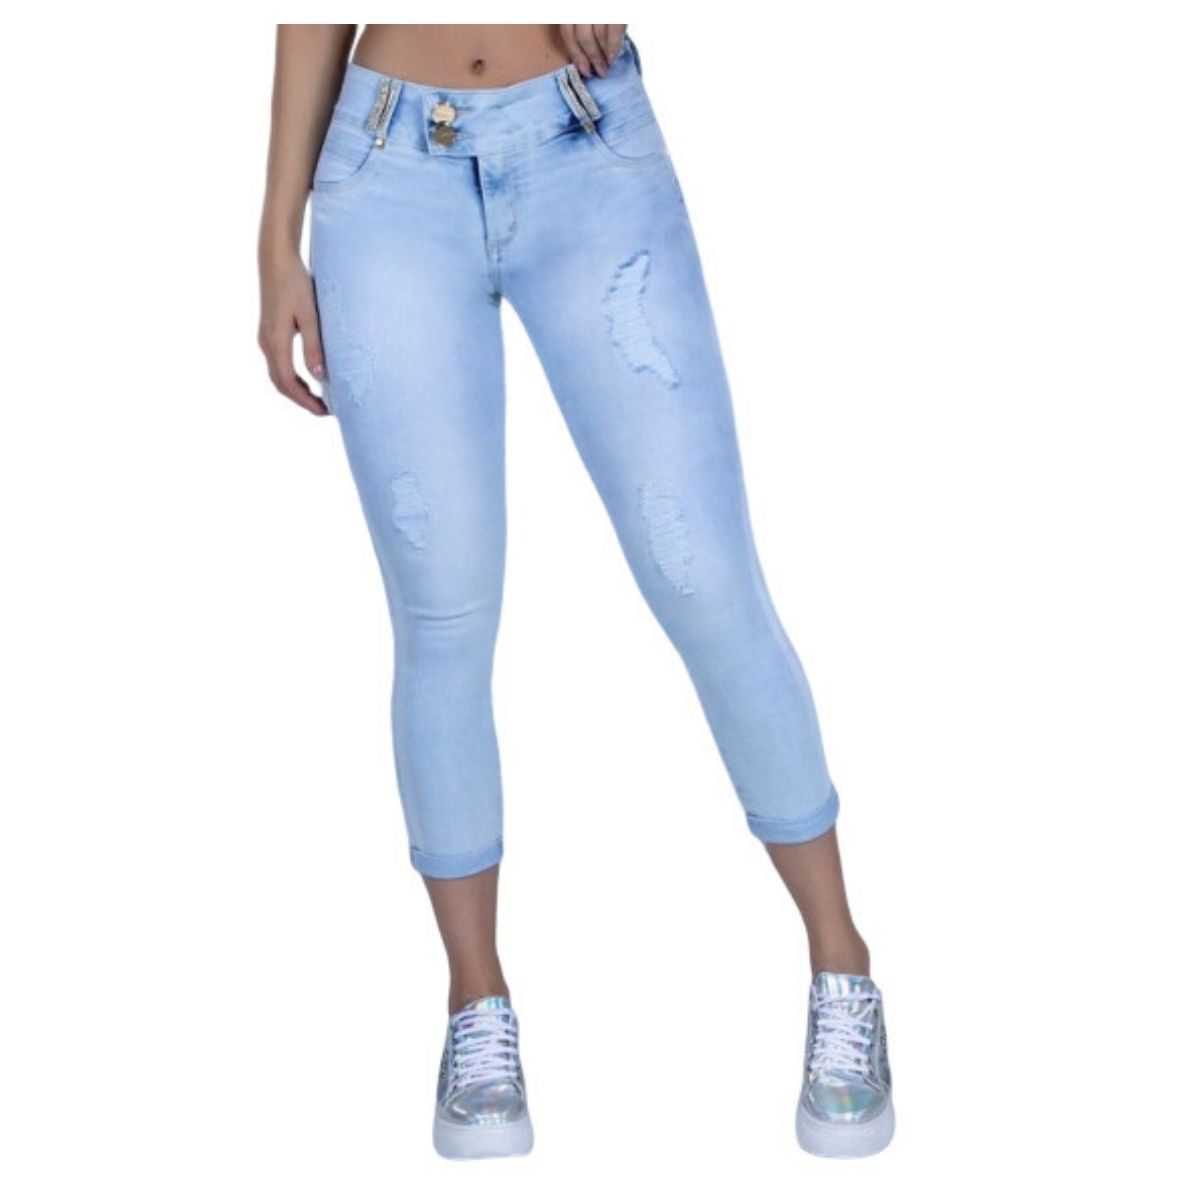 Calça Pit Bull Jeans 33426 Feminina Capri de Cintura Alta